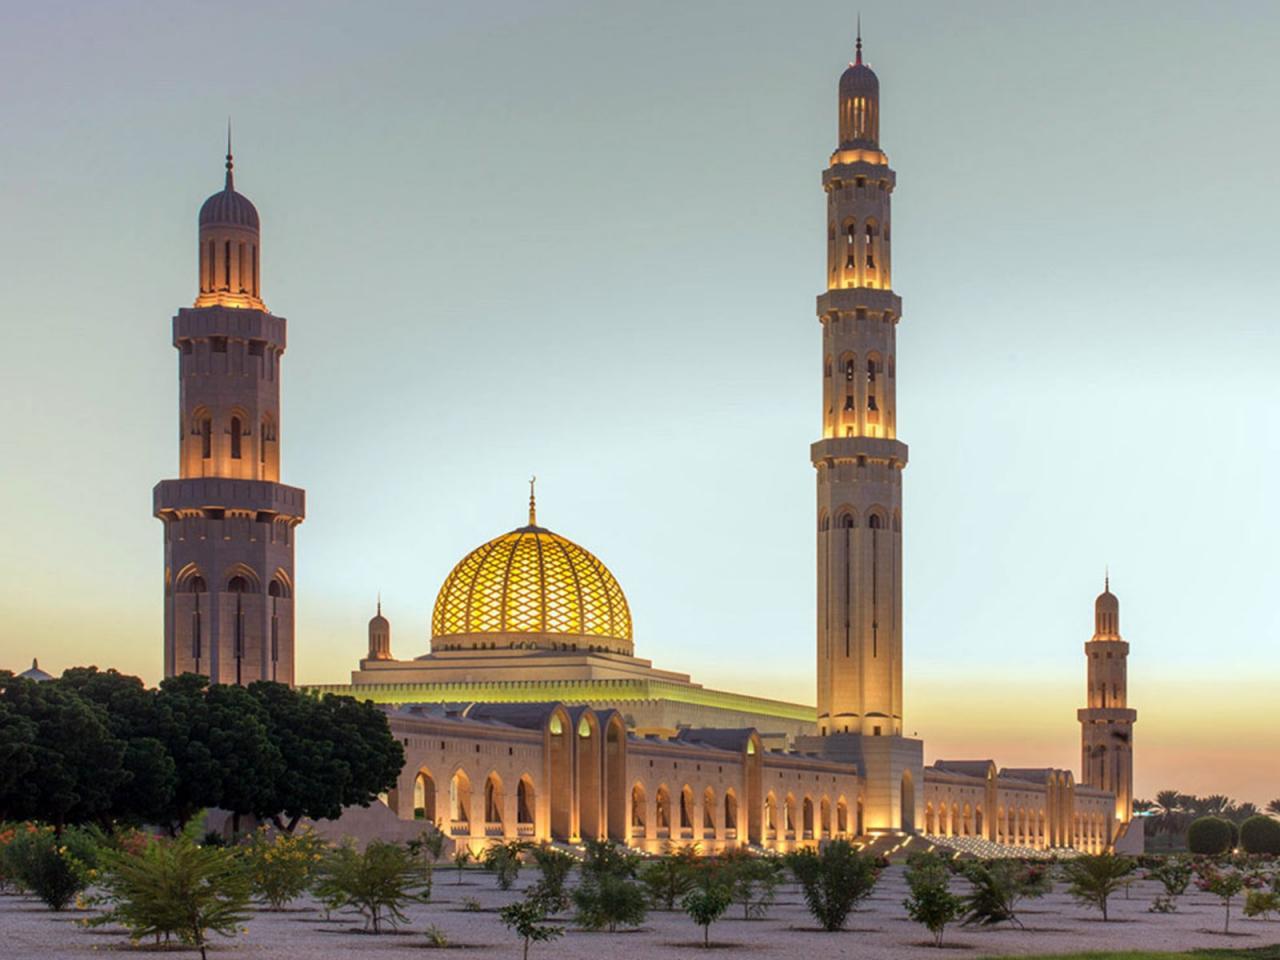 مسجد جامع سلطان قابوس واقع در شهر مسقط